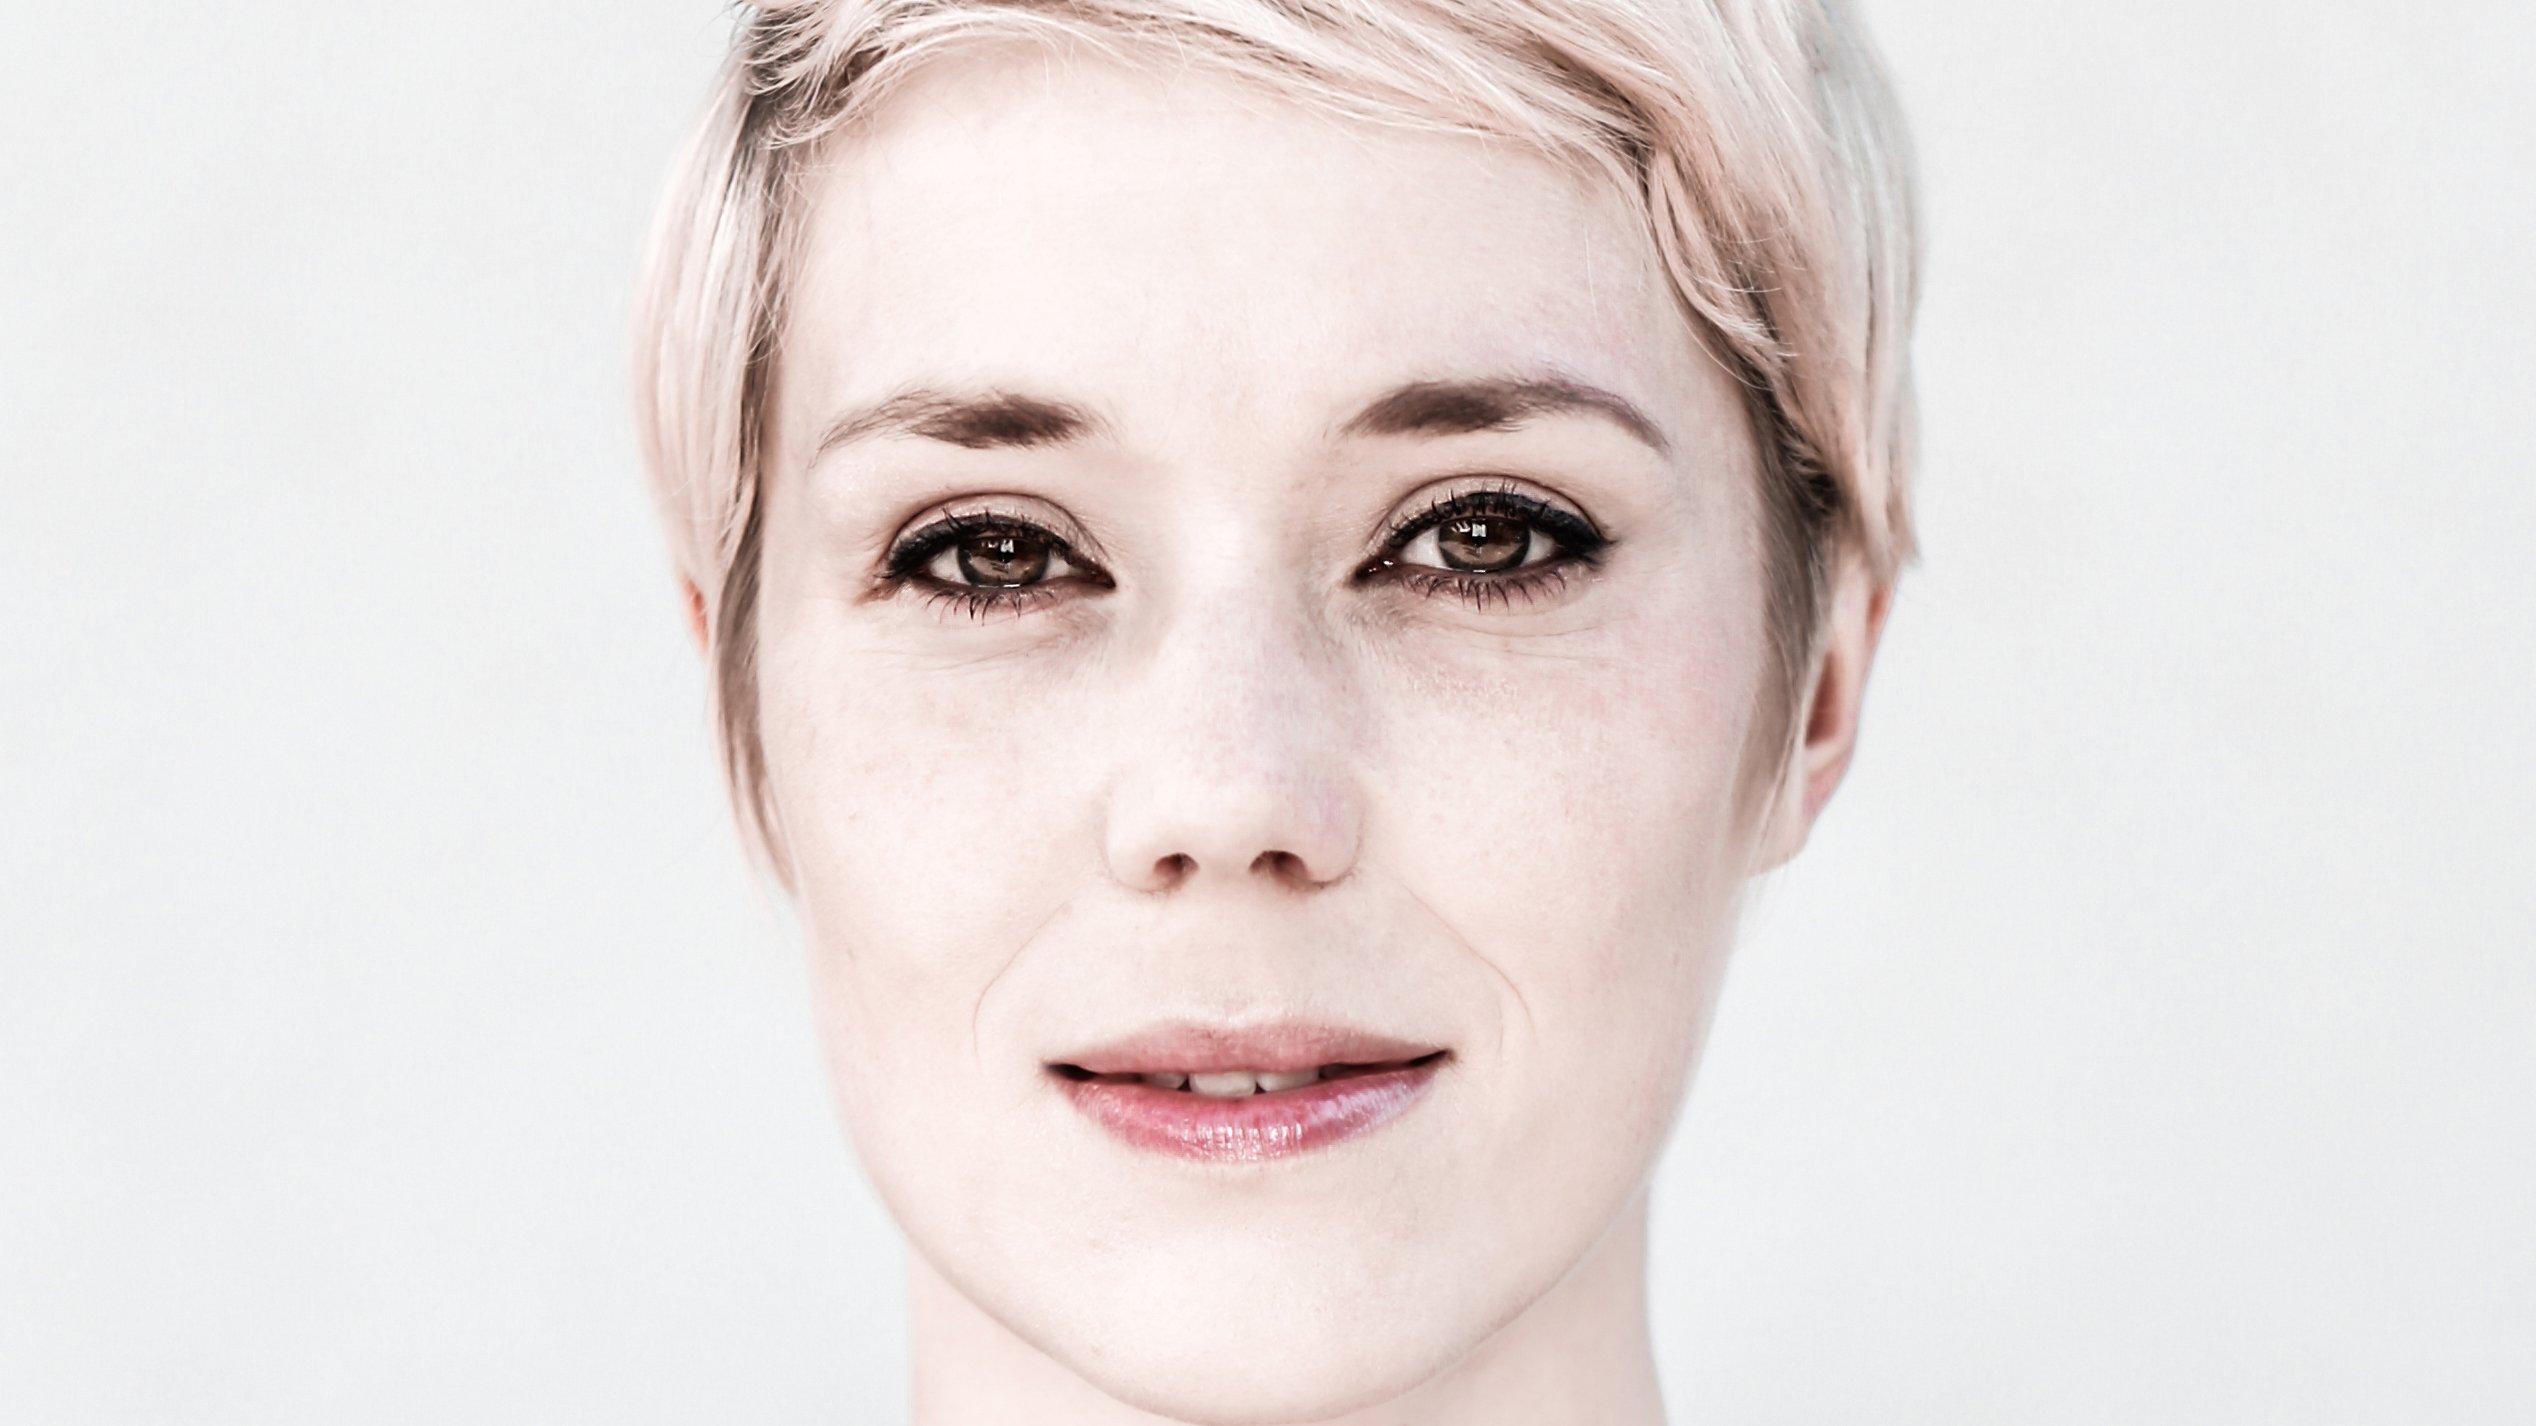 Dominique Ellen van de Pol